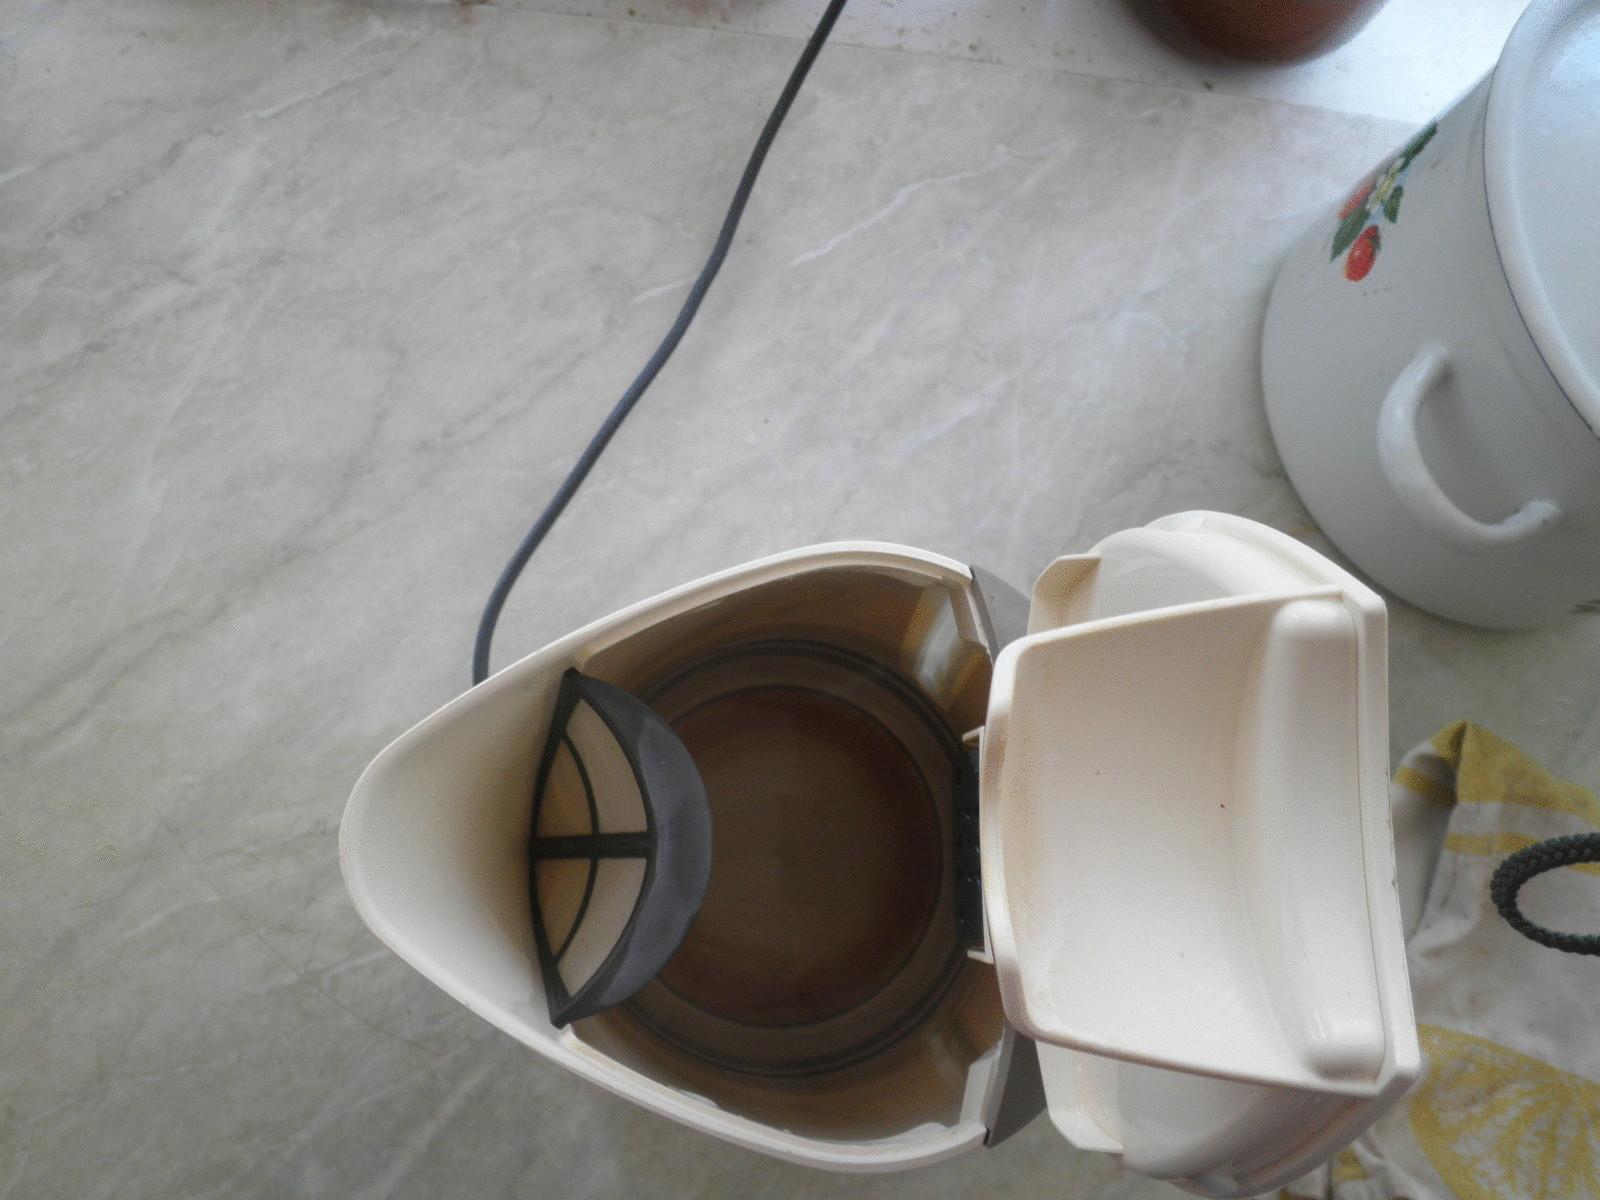 Ремонт чайника браун своими руками